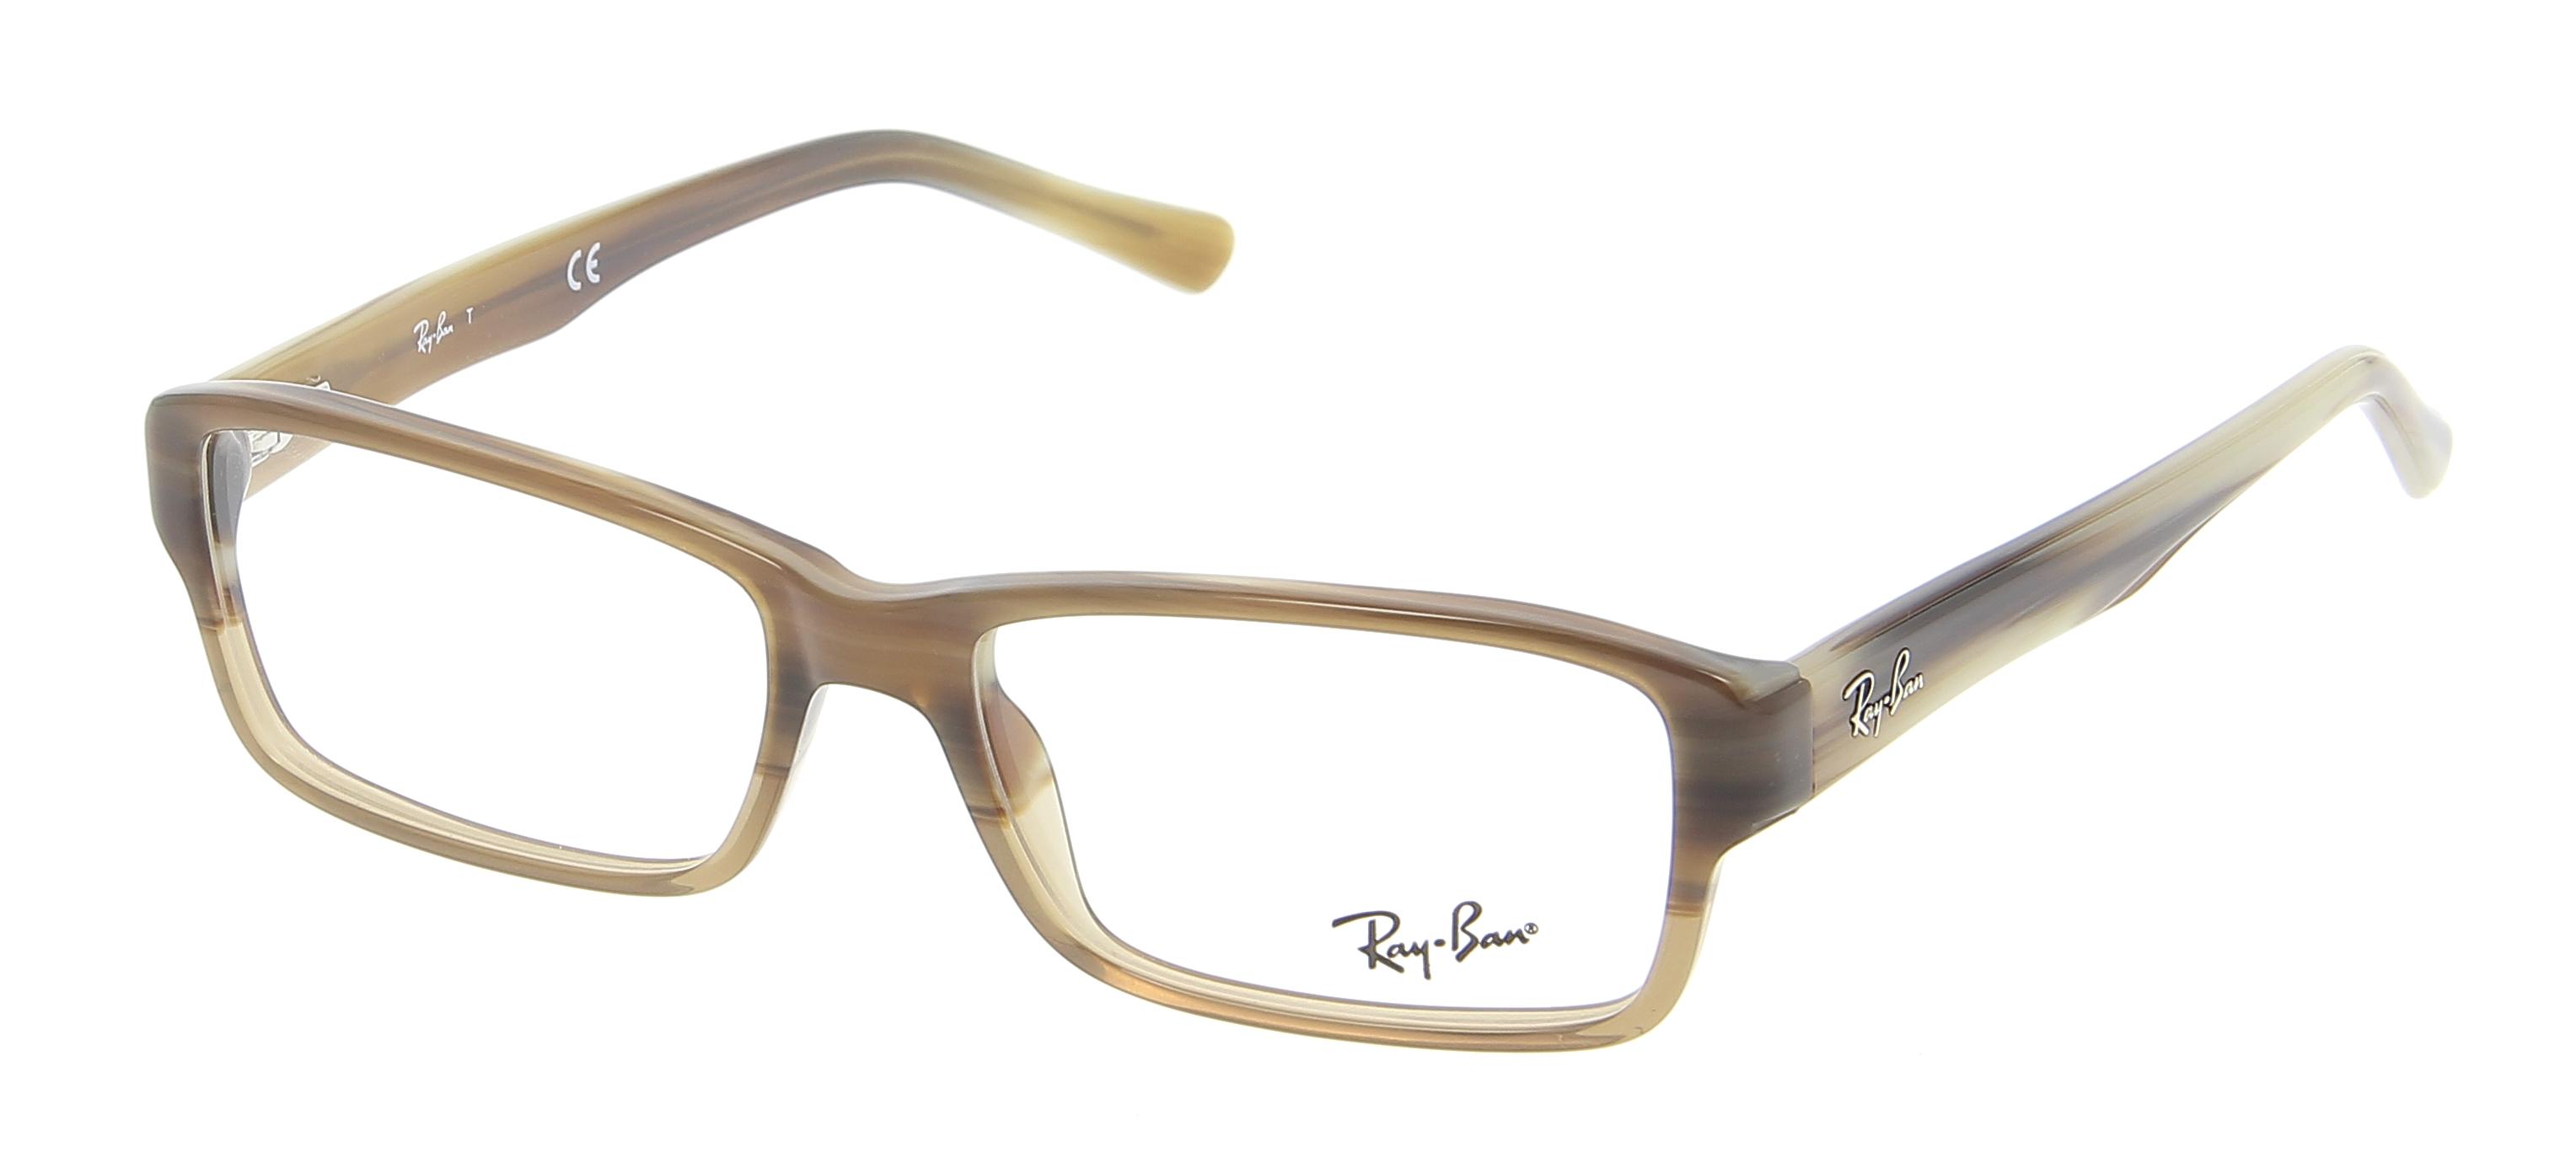 okulary ray ban b&l